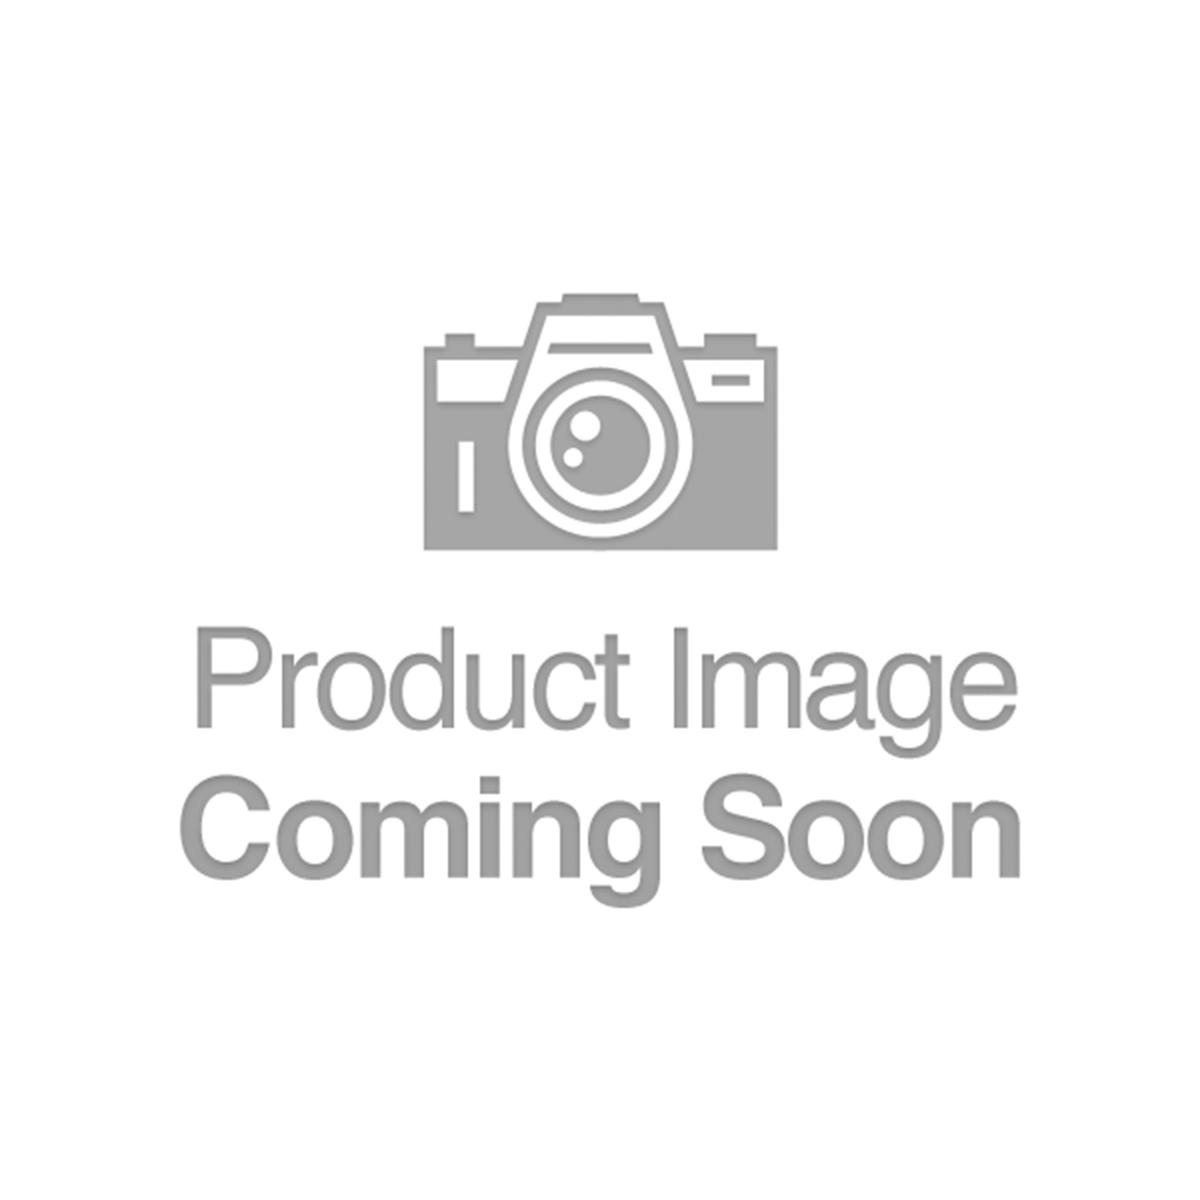 Original 1783 Chalmers Short Worm Shilling PCGS F12